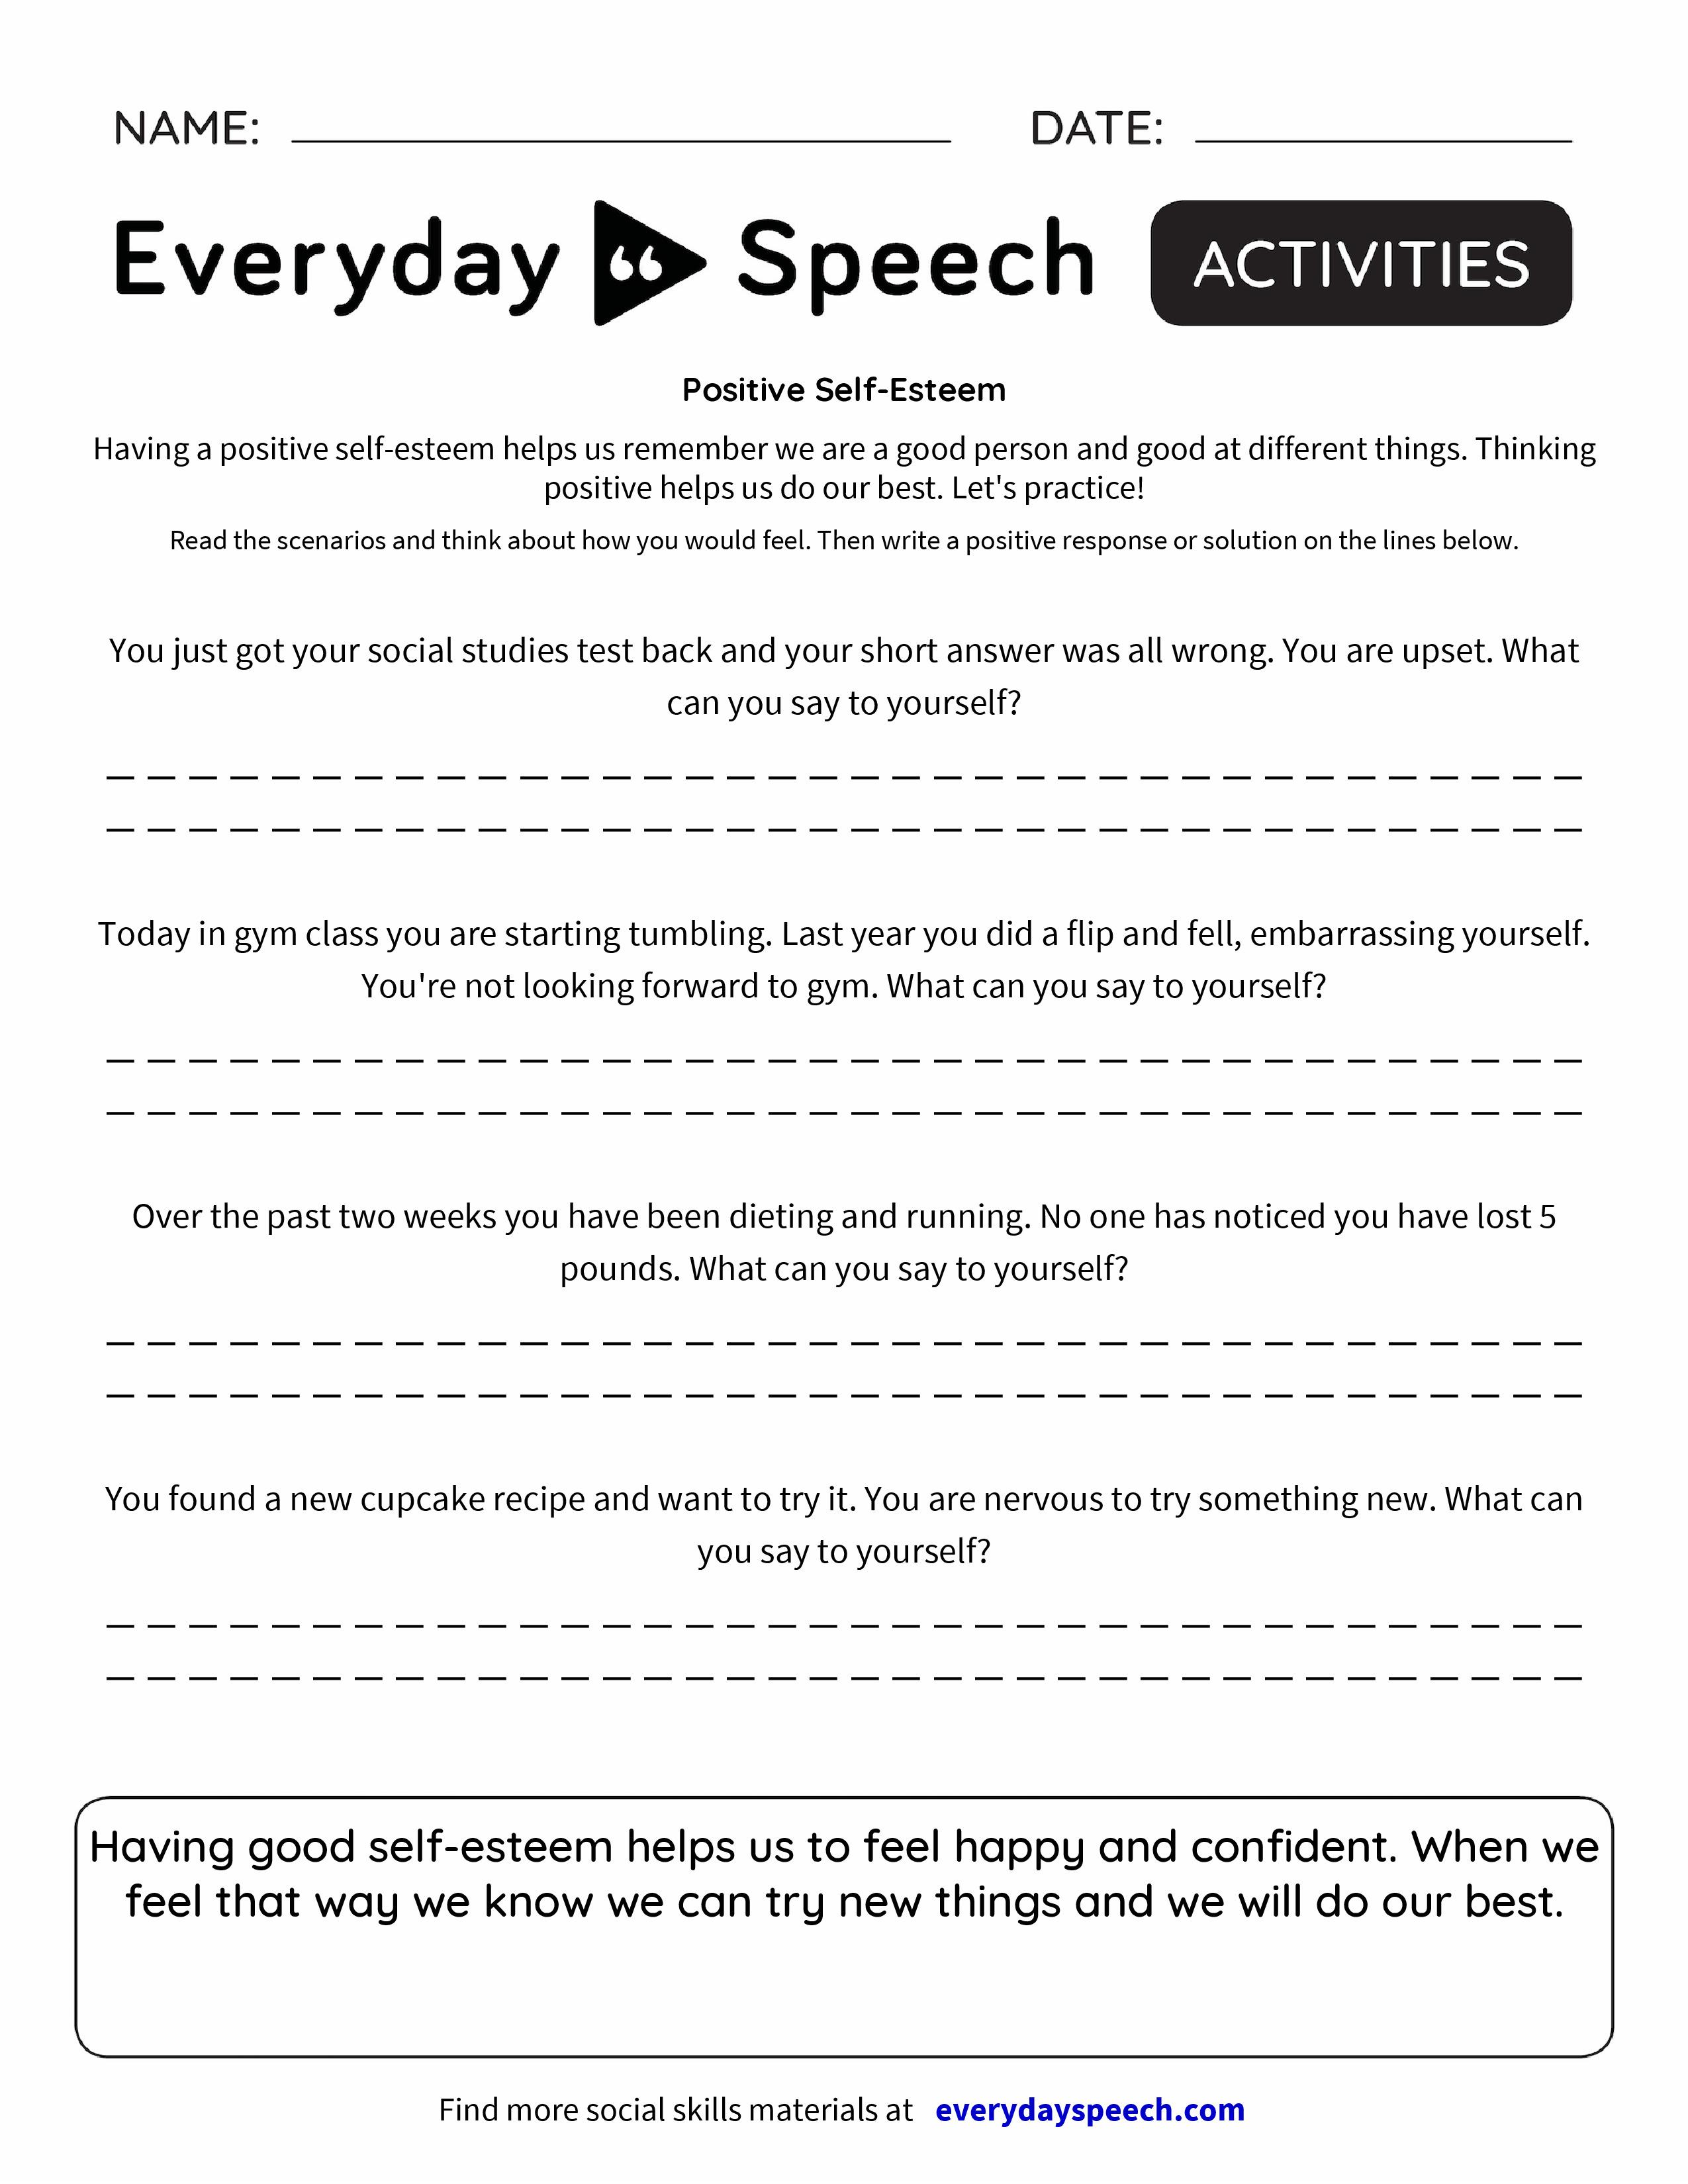 worksheet Self Esteem Worksheet positive self esteem everyday speech preview preview